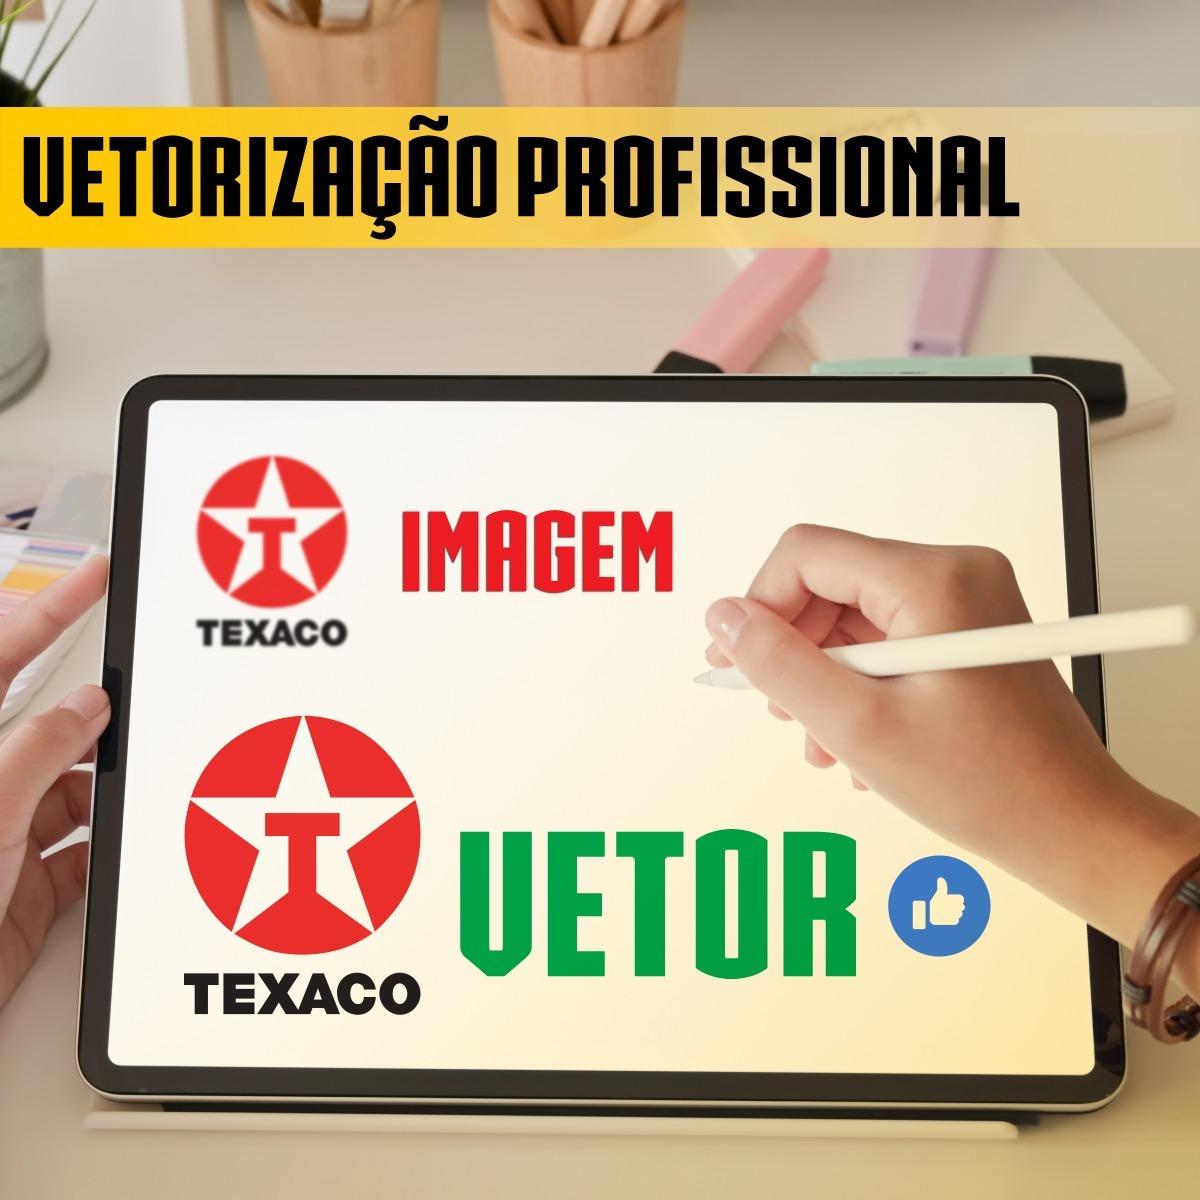 IMAGENS GRATUITO DOWNLOAD DE VETORIZADOR